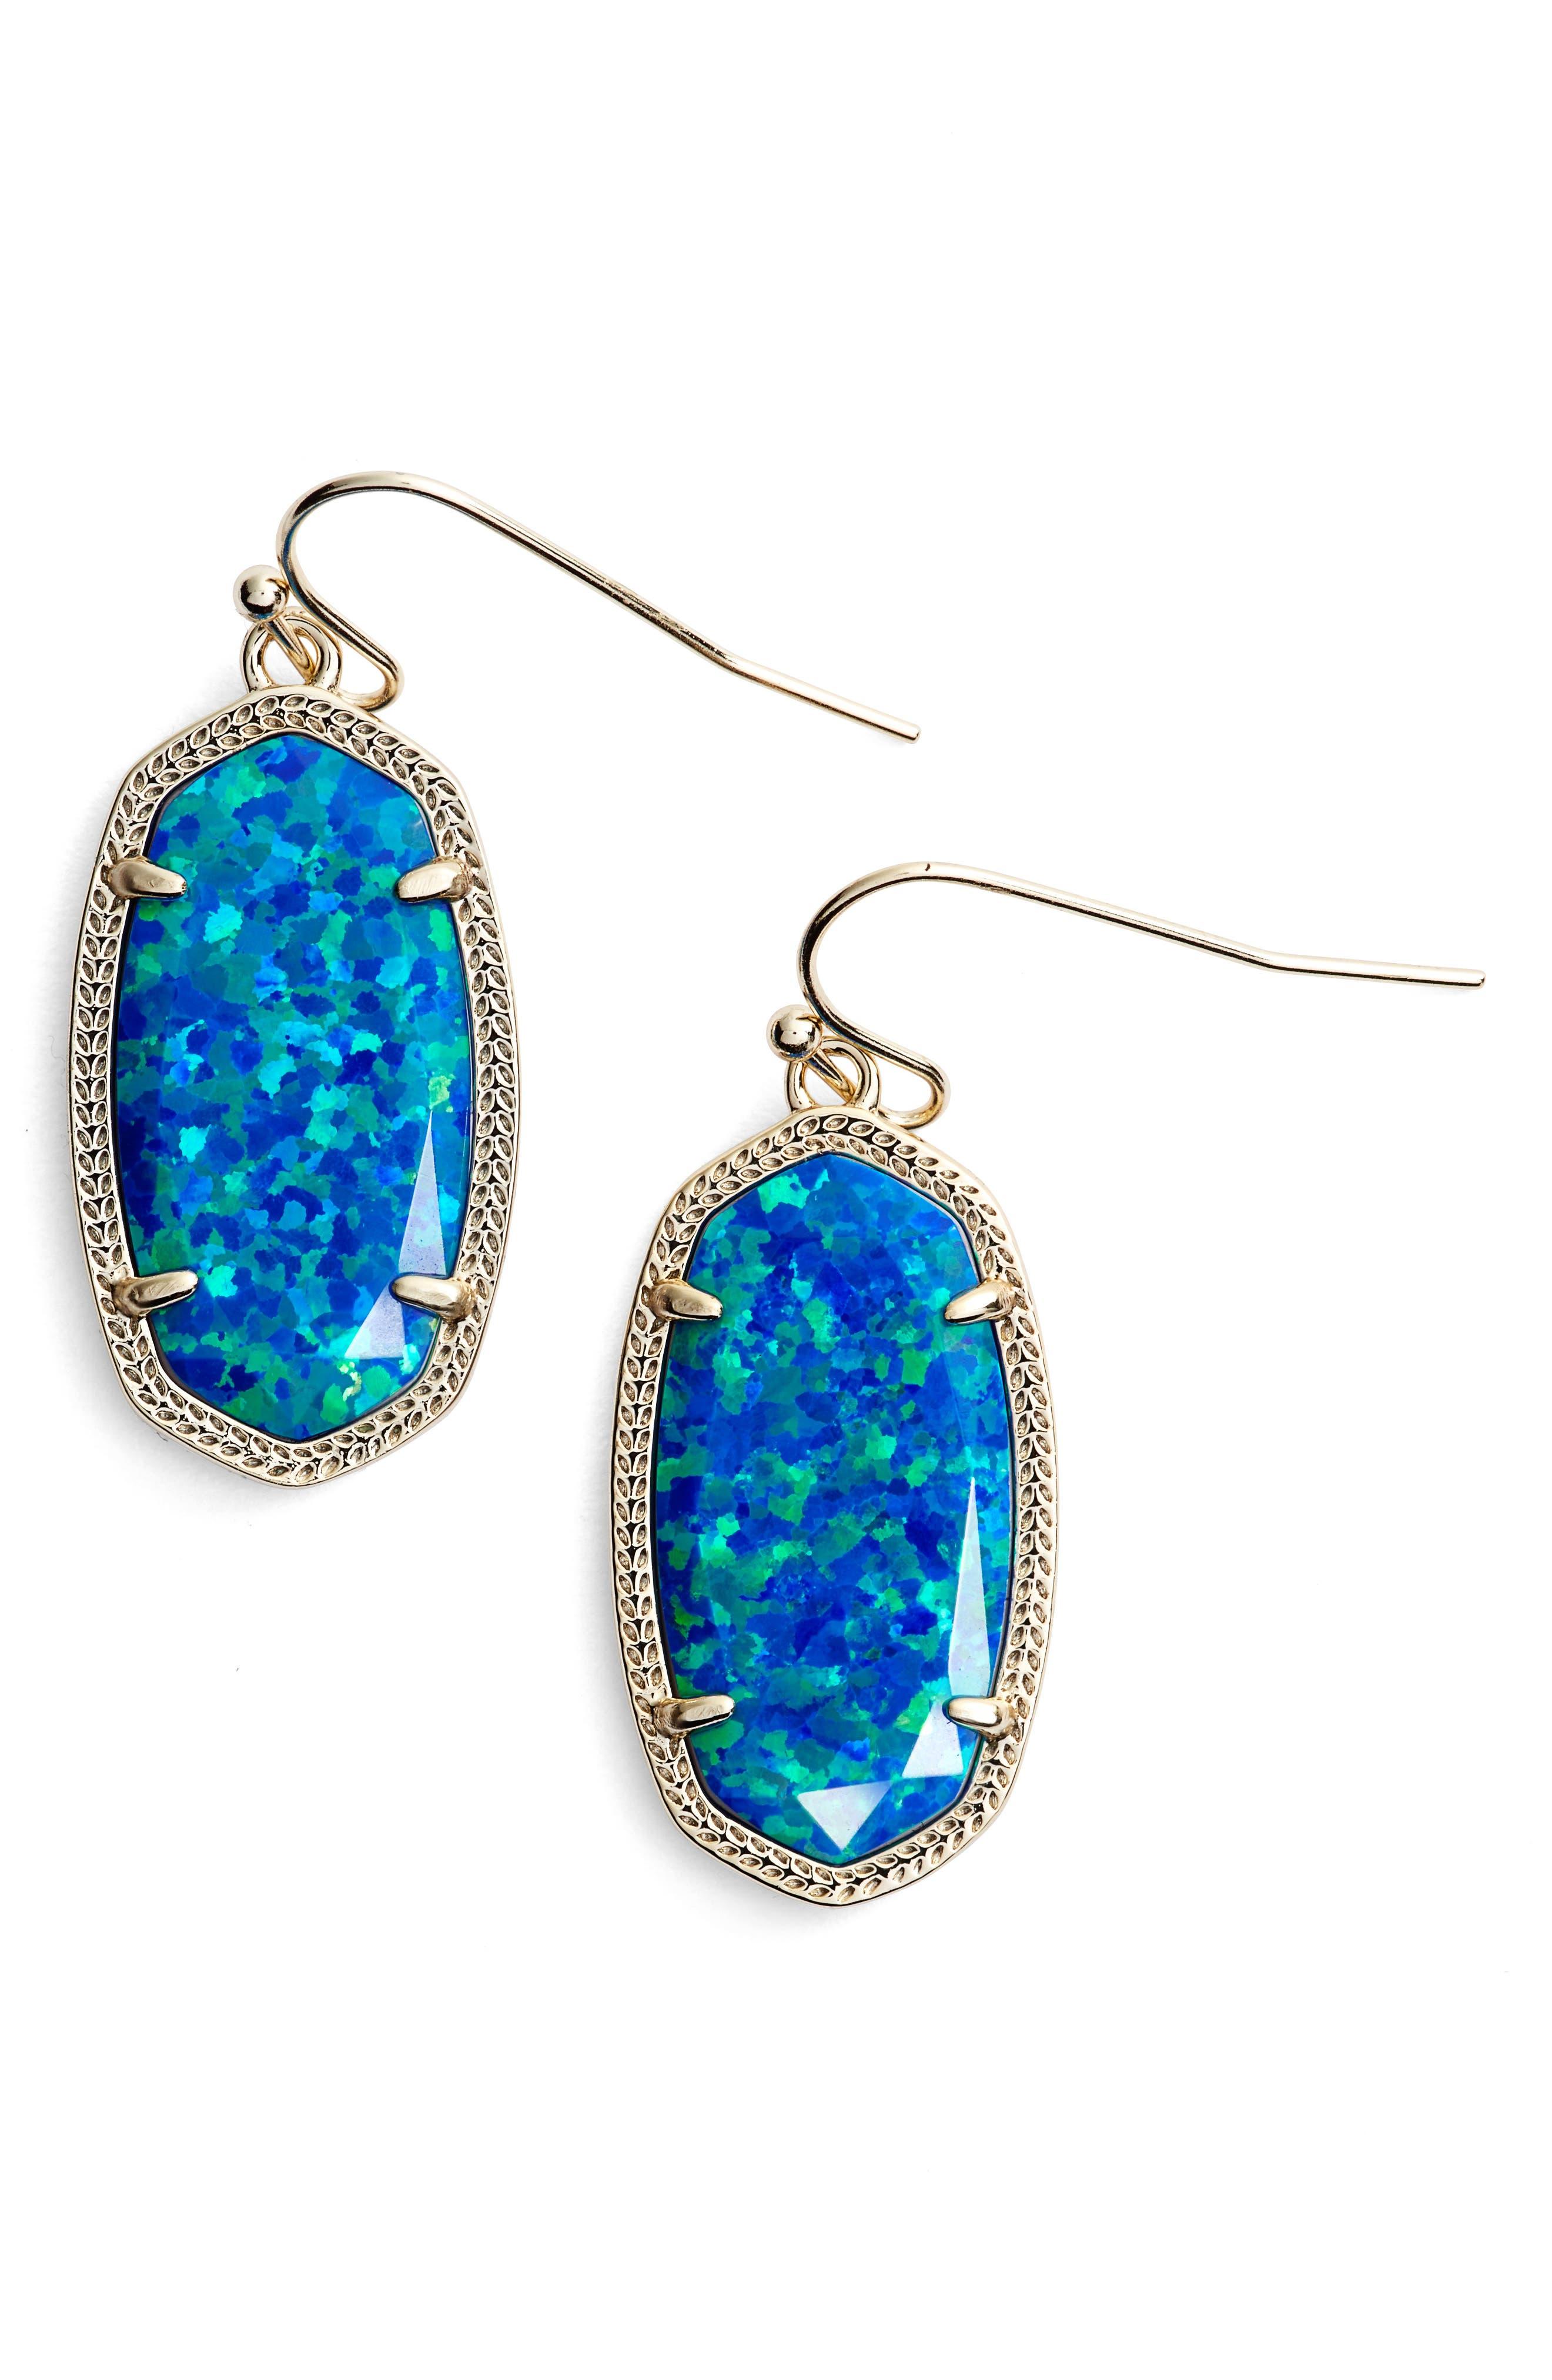 Dani Stone Drop Earrings,                         Main,                         color, Royal Blue Kyocera Opal/ Gold